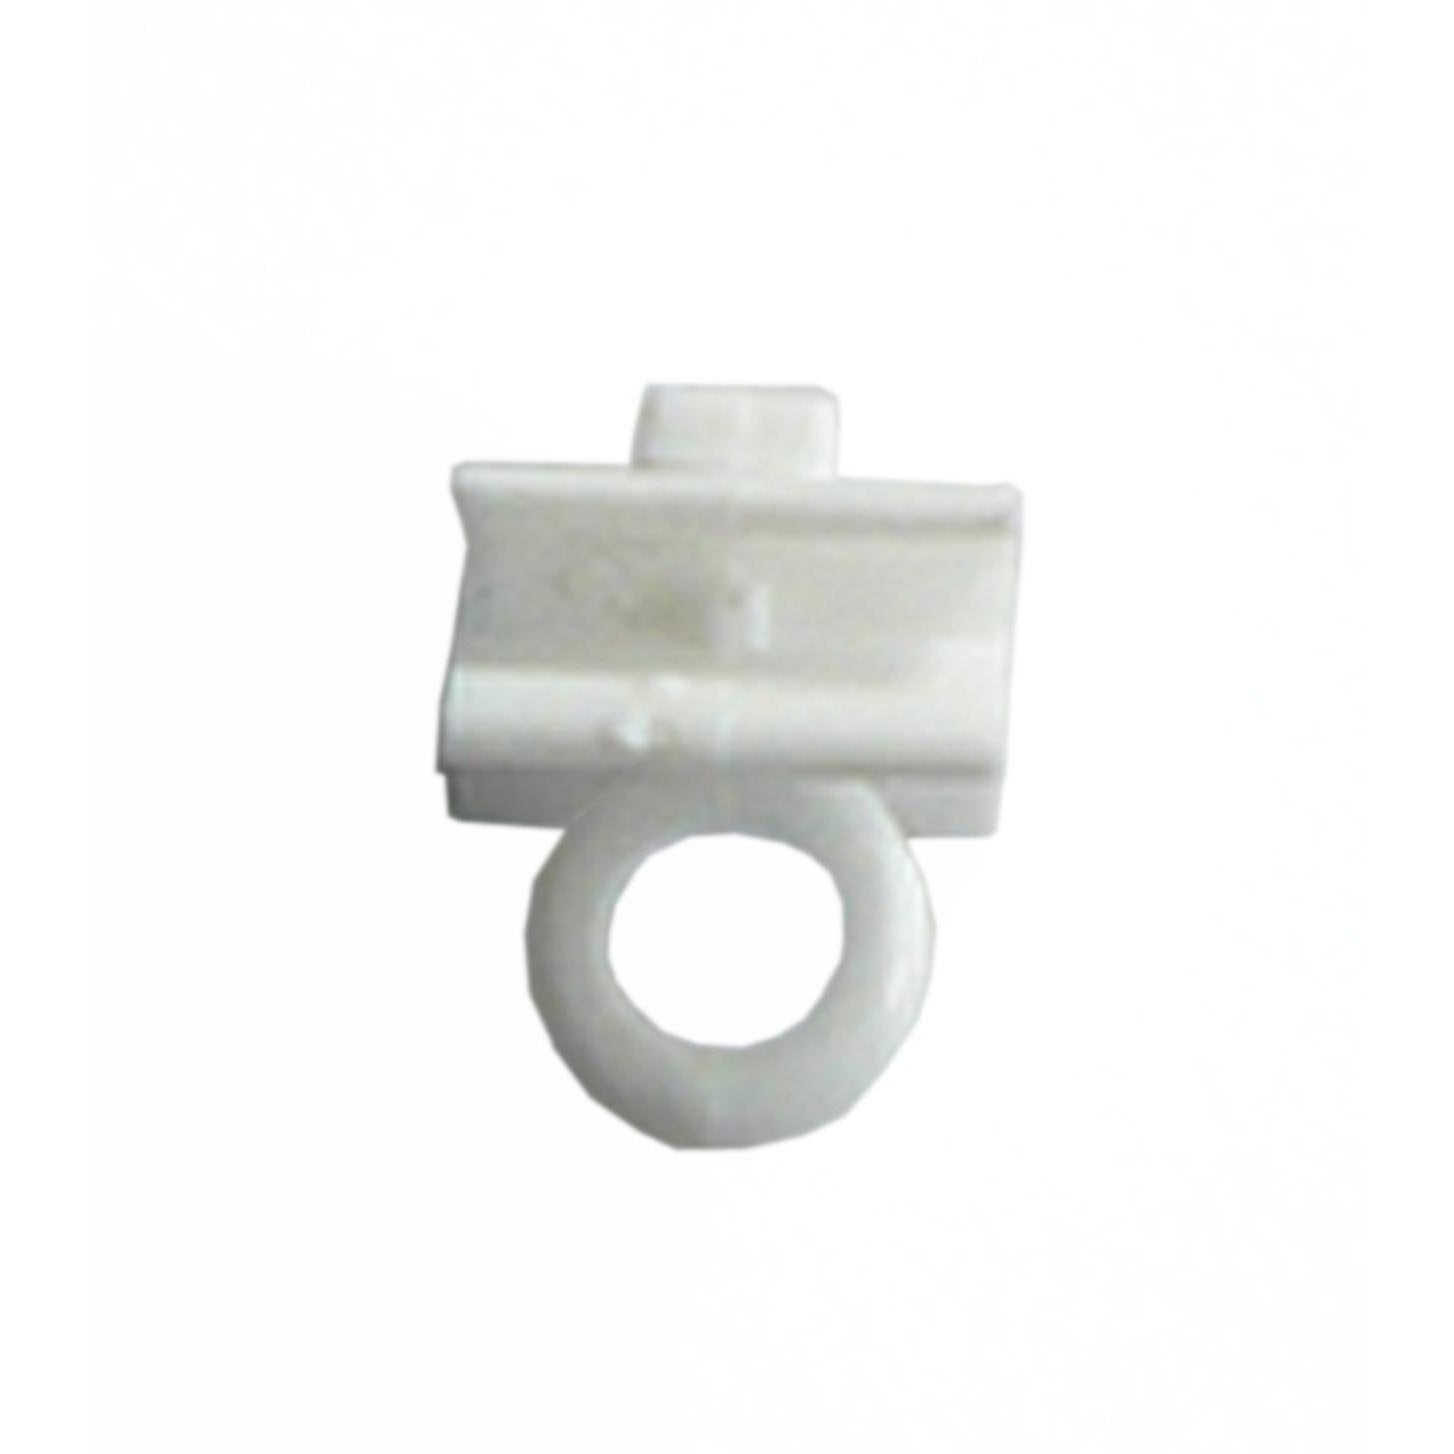 Rollo Moderne DEL culasse Plaque Plafond Spotlight en finition blanche 3173WH